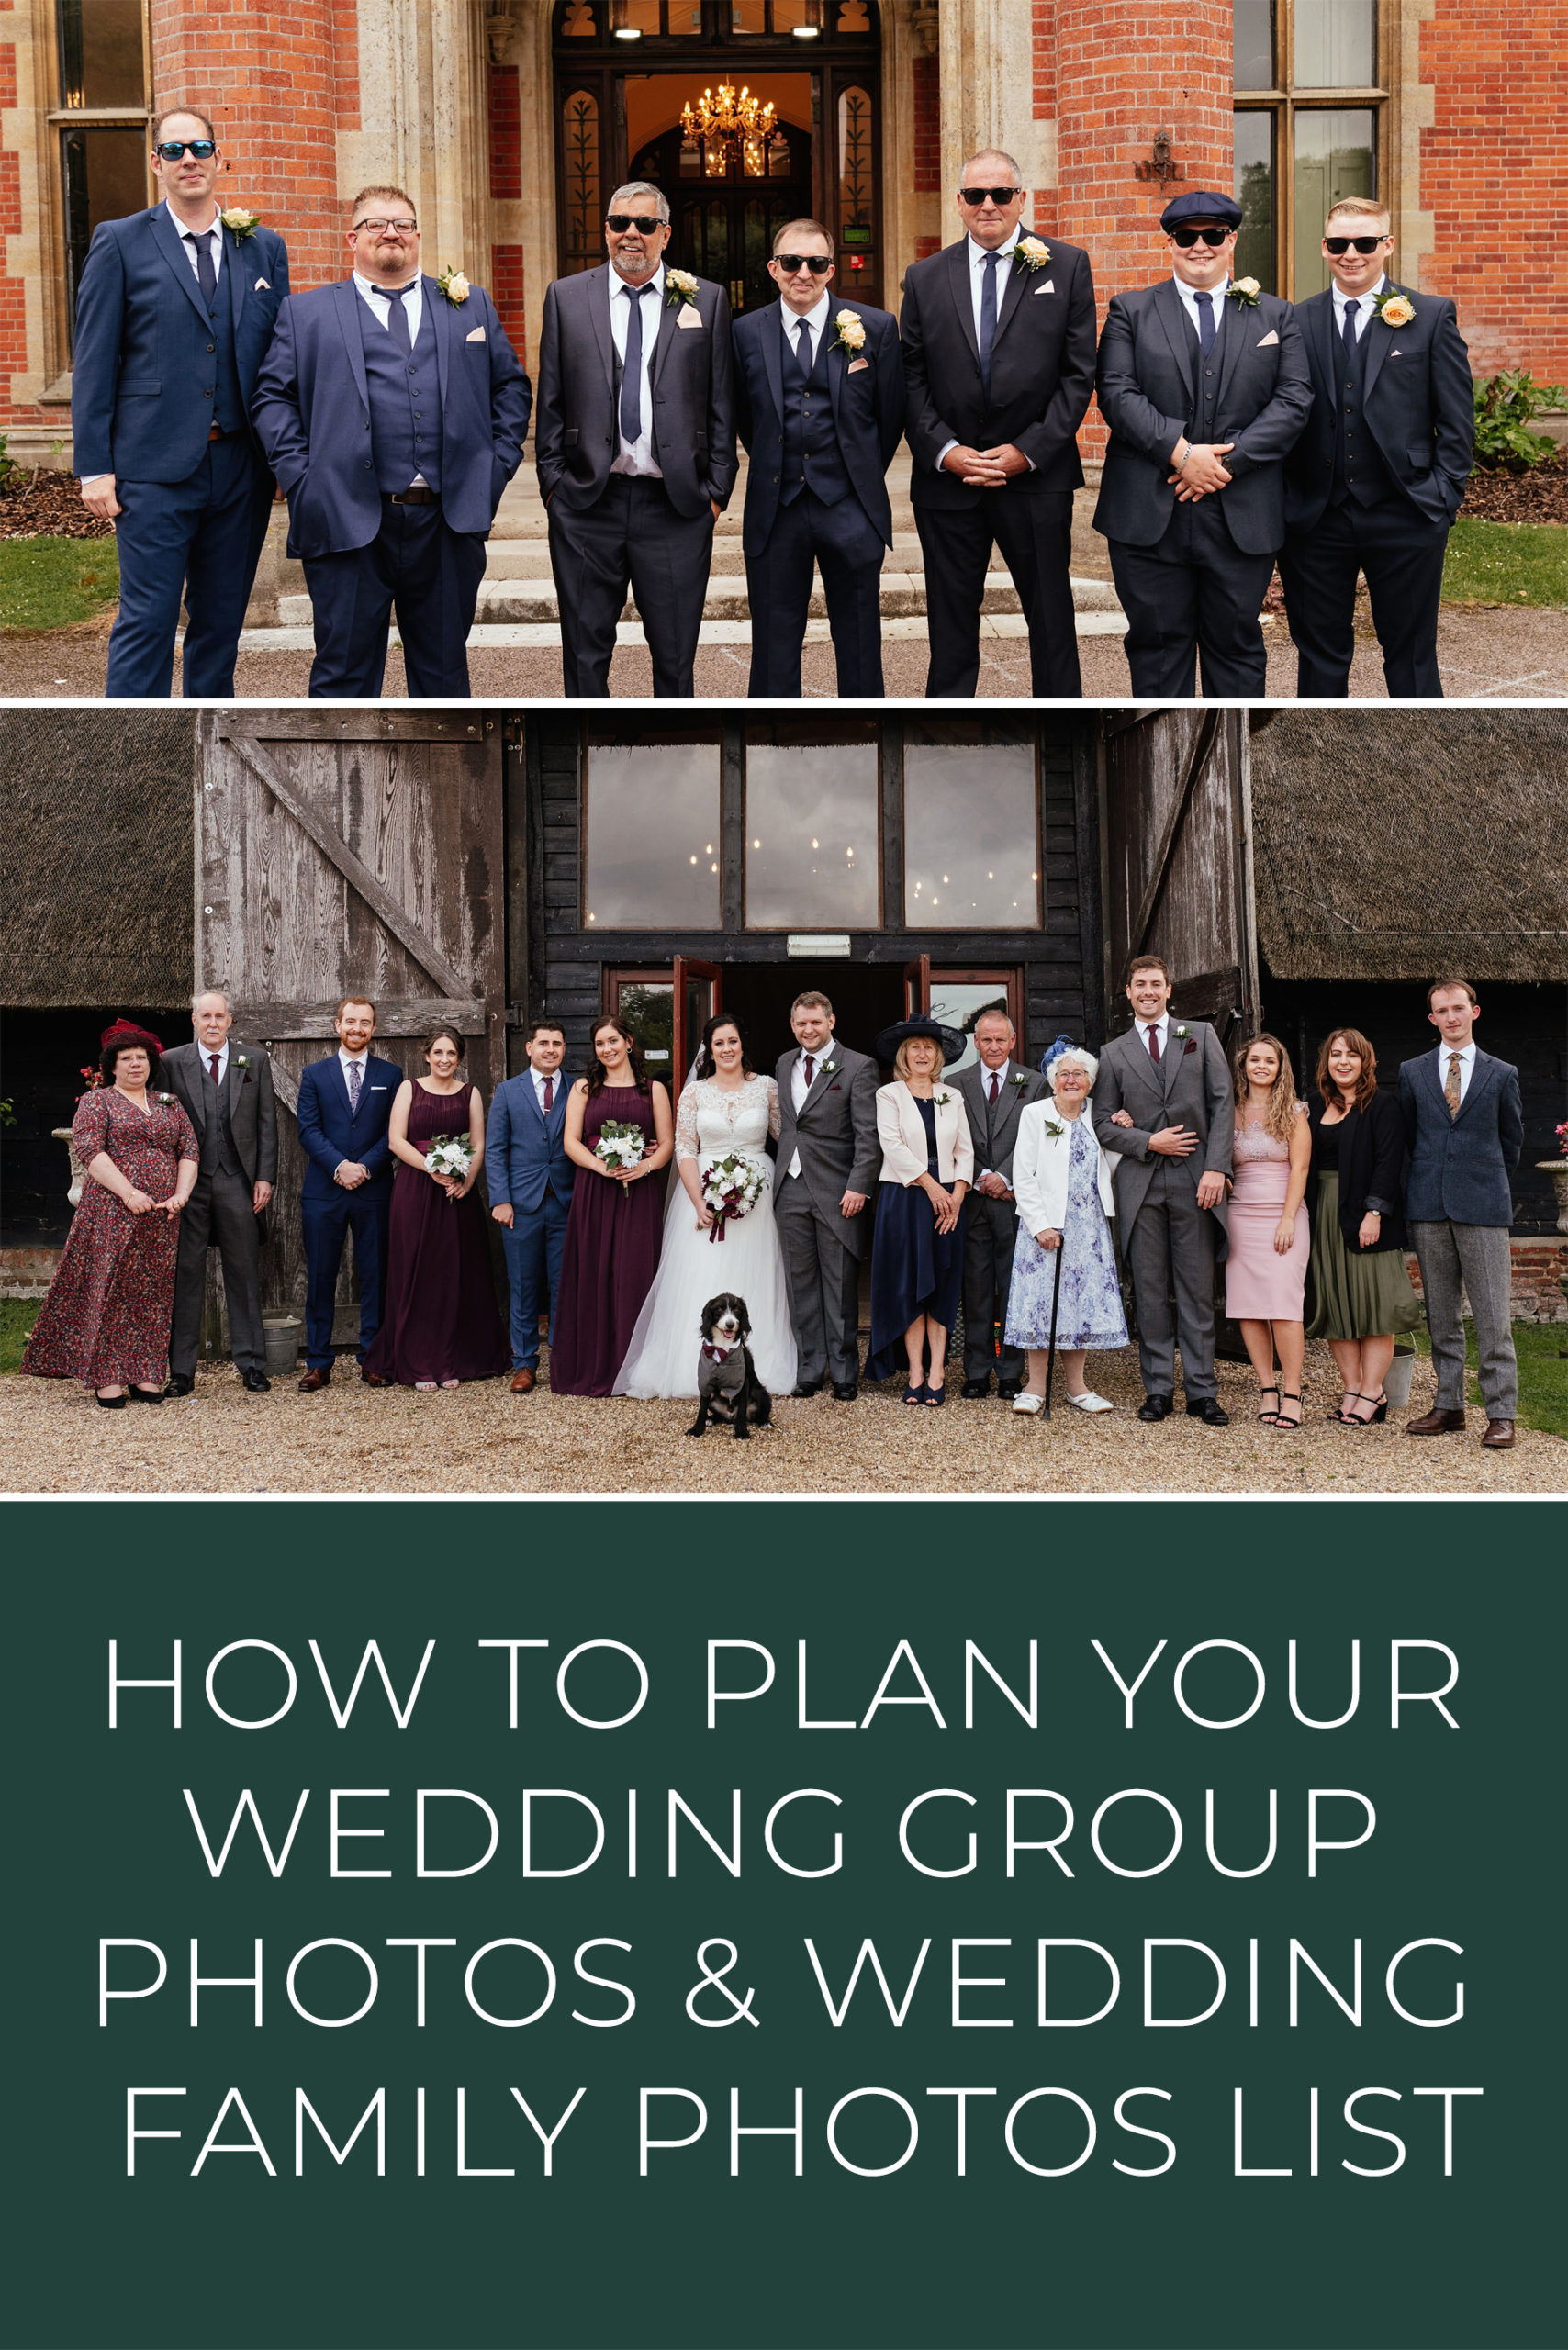 How To Plan Your Wedding Group Photos & Wedding Family Photos List